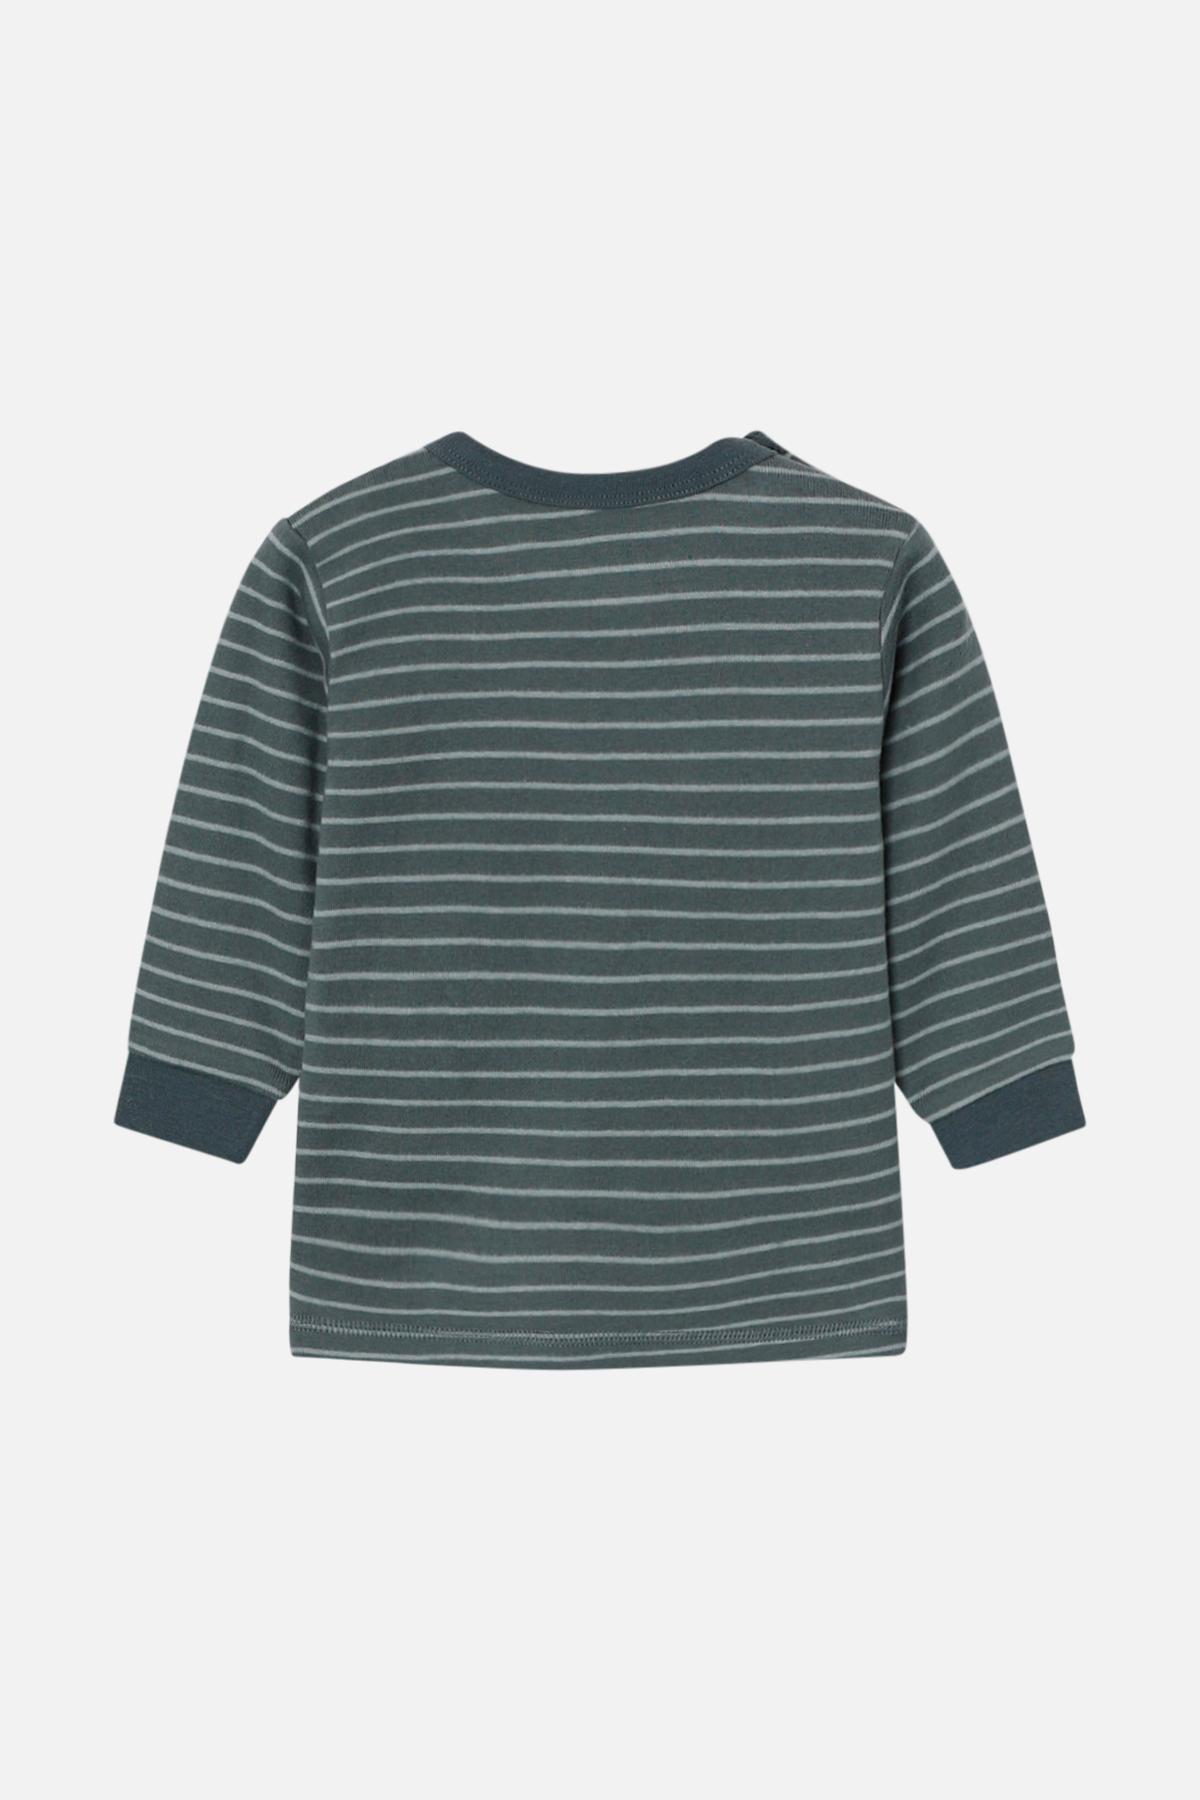 Uni - Andrew - T-shirt